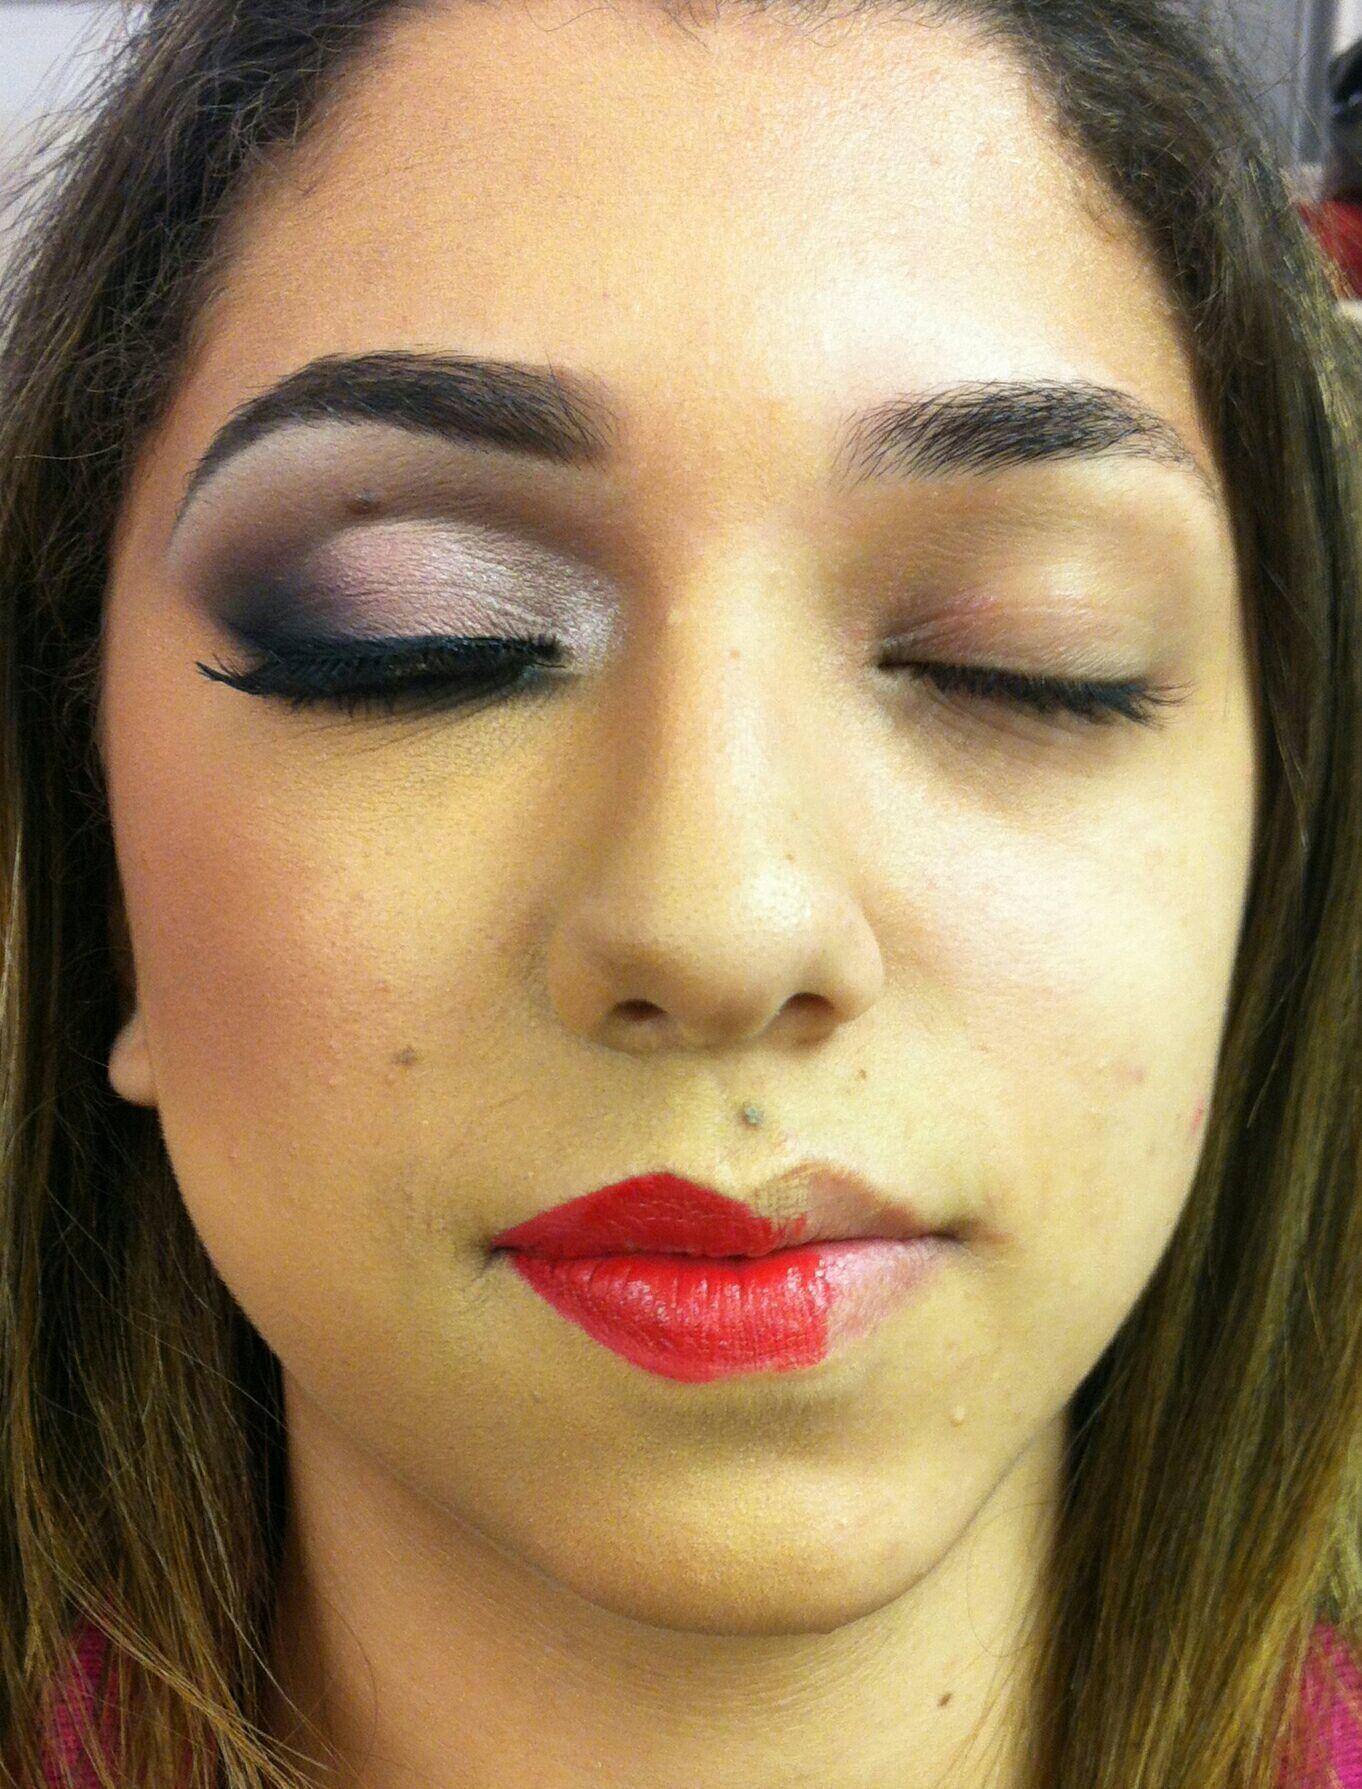 #maquiagem #makeup maquiagem maquiador(a)